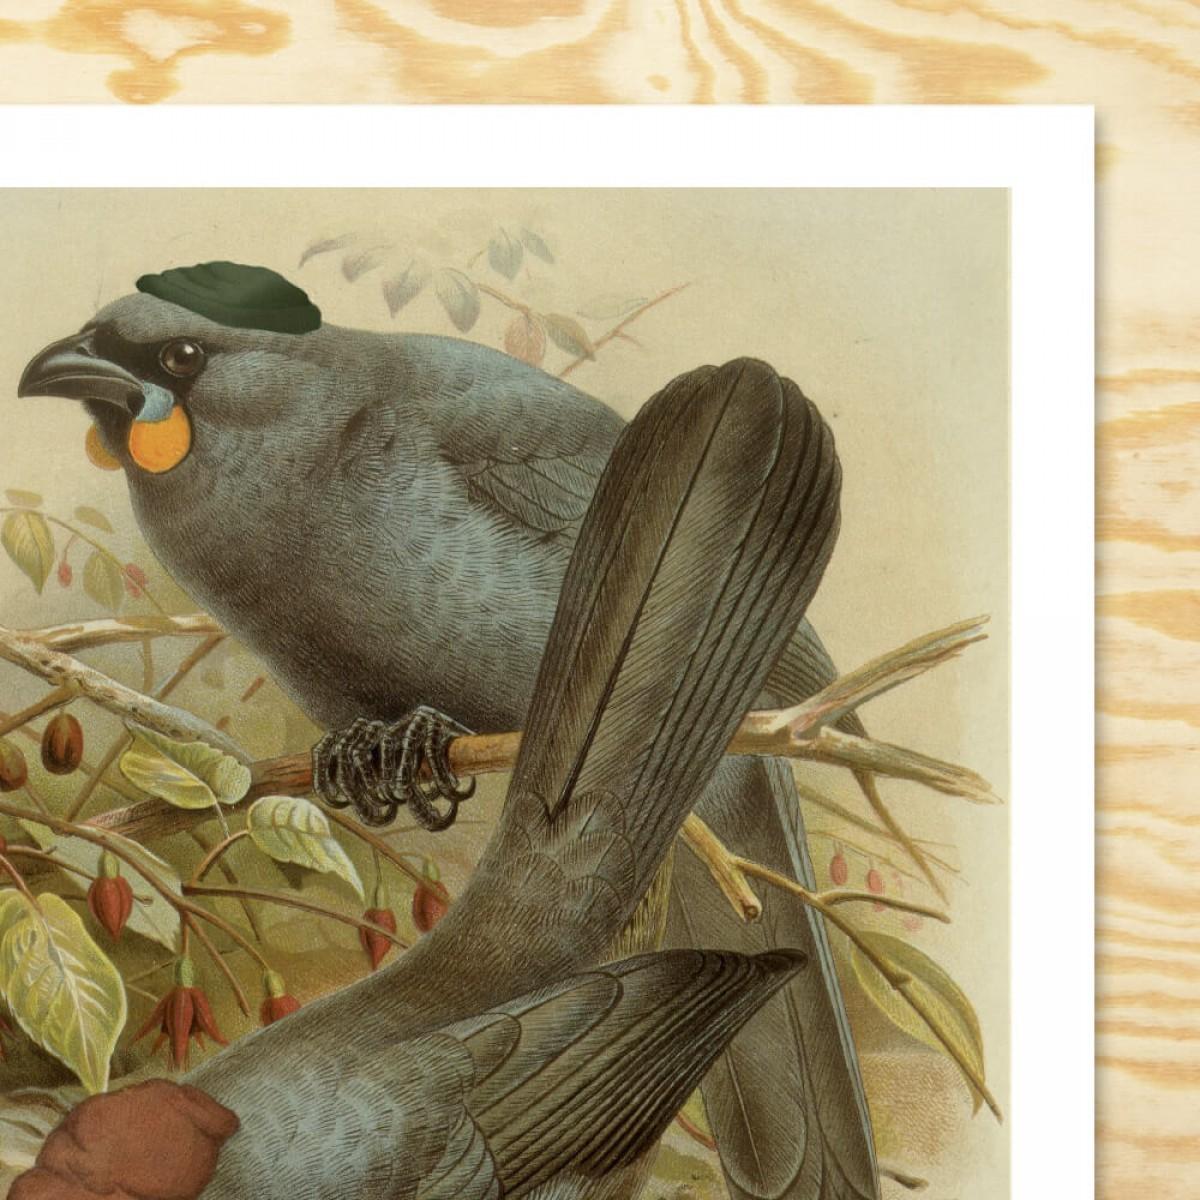 Chiara Tempel – Paradiesvögel #2 – Beaniekrähe – Poster A3 (297x420mm)